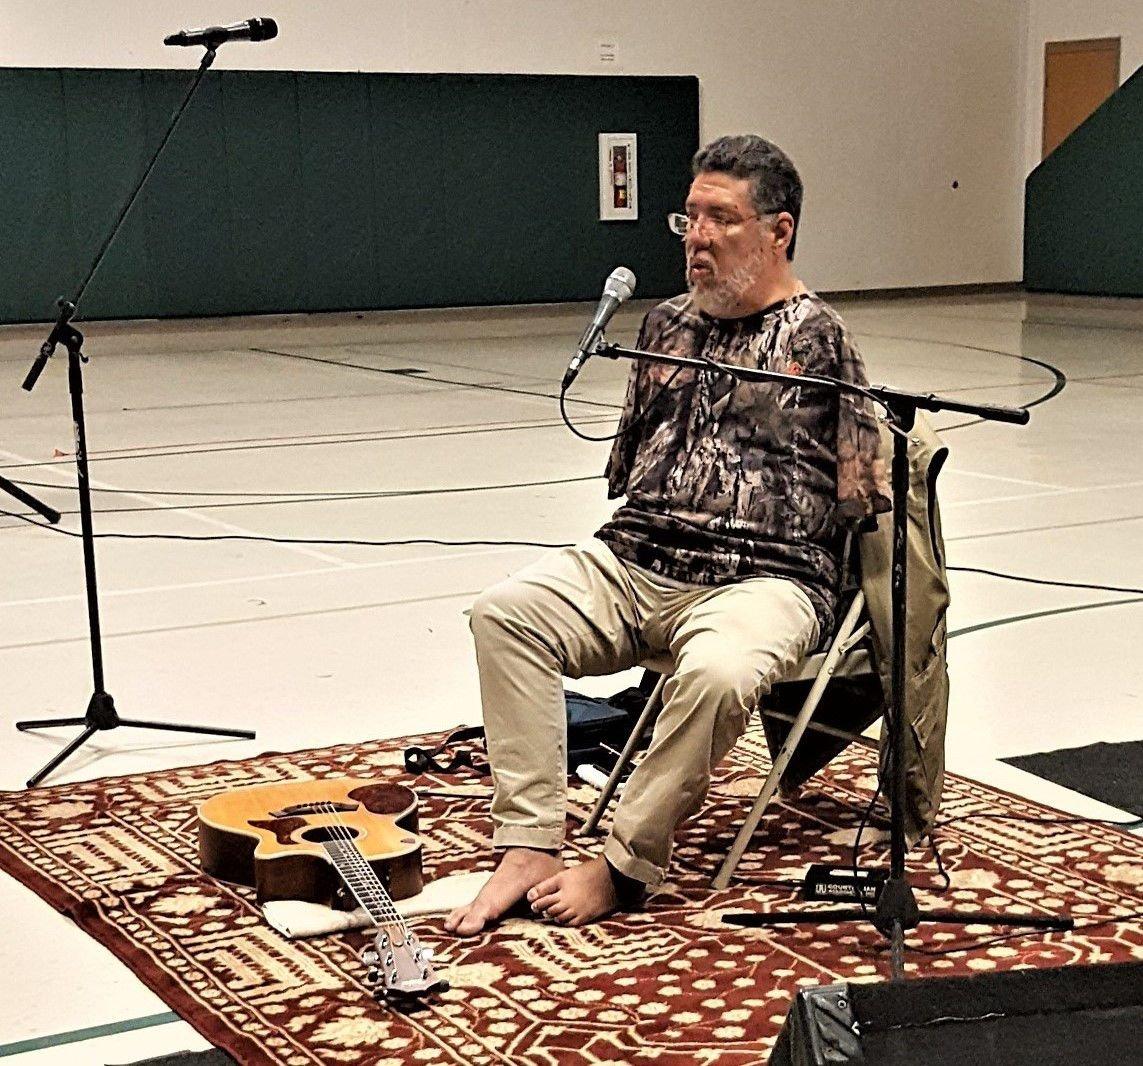 Tony Melendez, armless guitarist, to perform free concert Oct. 24